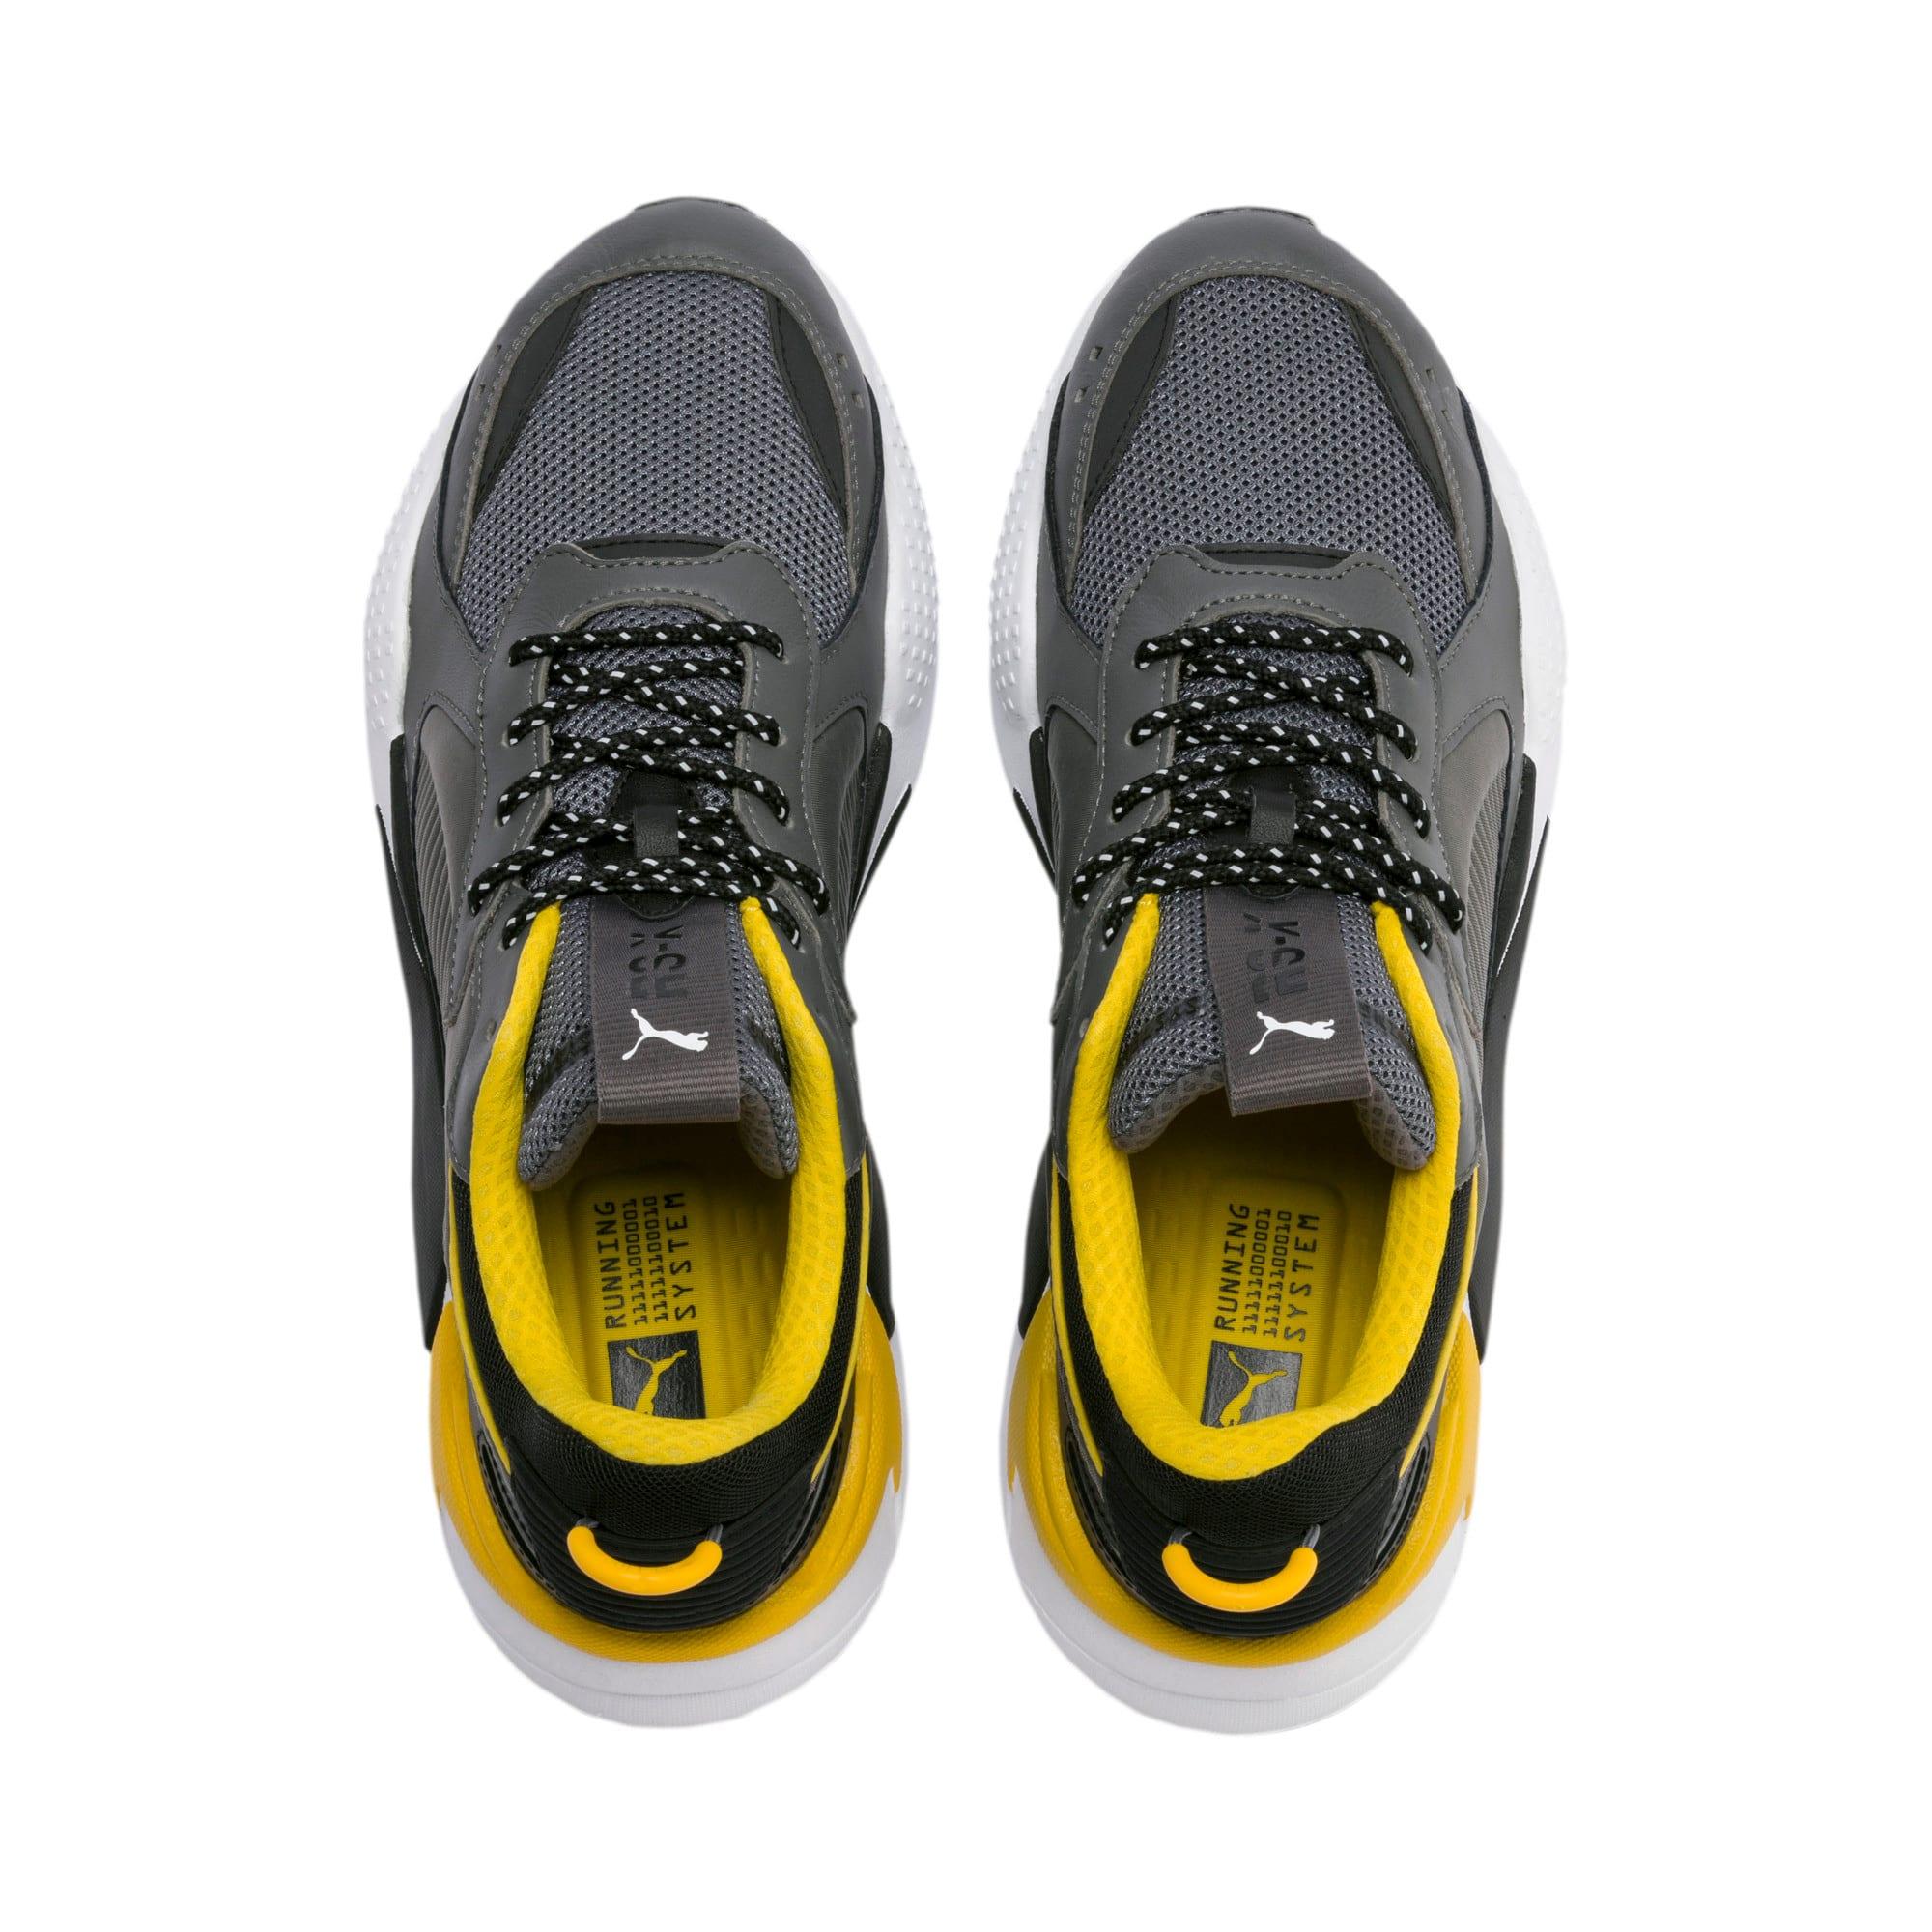 Thumbnail 7 of RS-X Core Sneakers, CASTLEROCK-Puma Black, medium